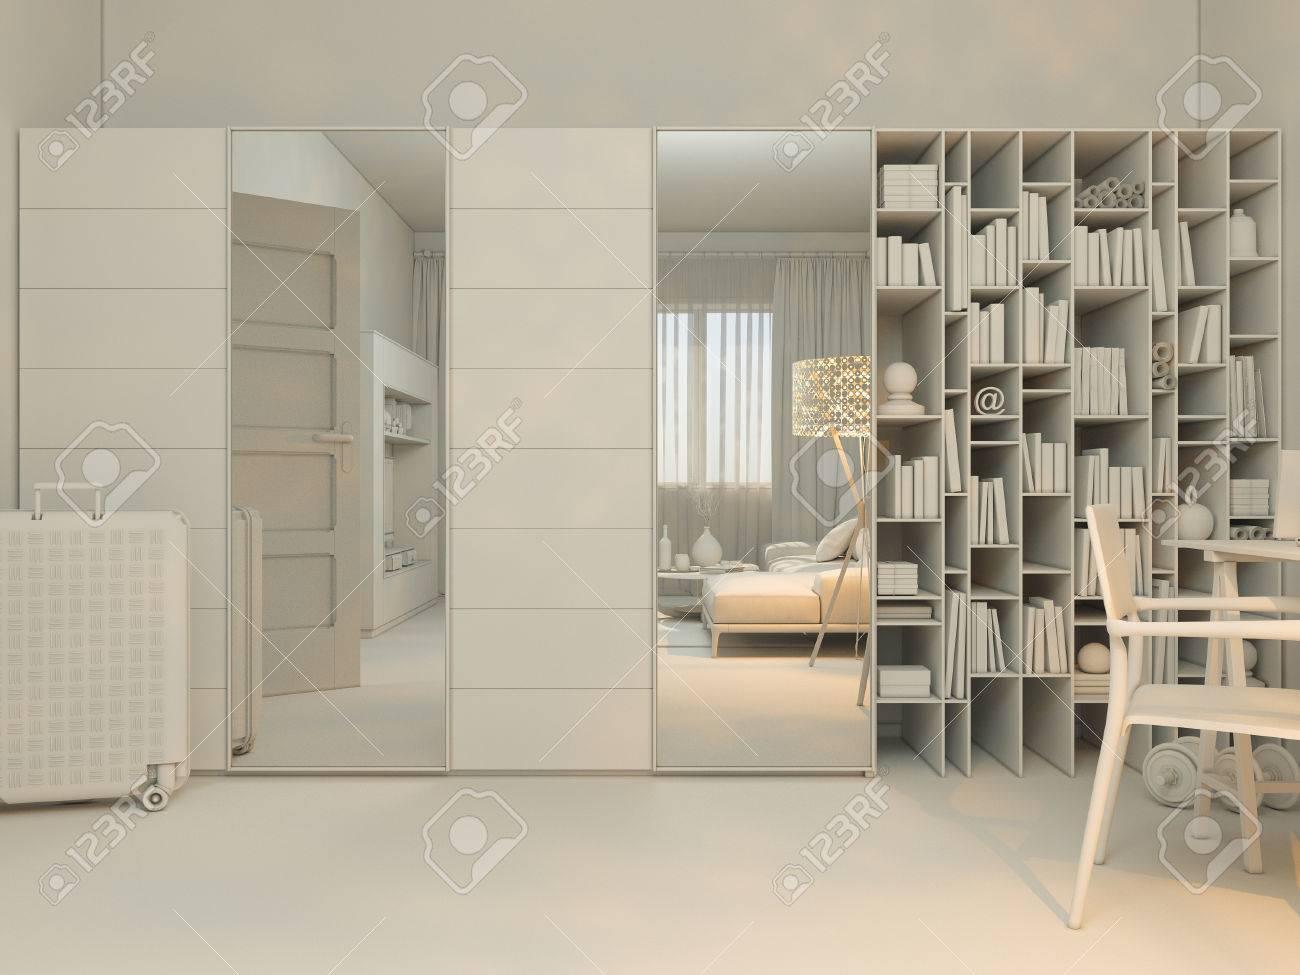 Awesome Minimalist Studio Apartment Photos - Home Design Ideas ...